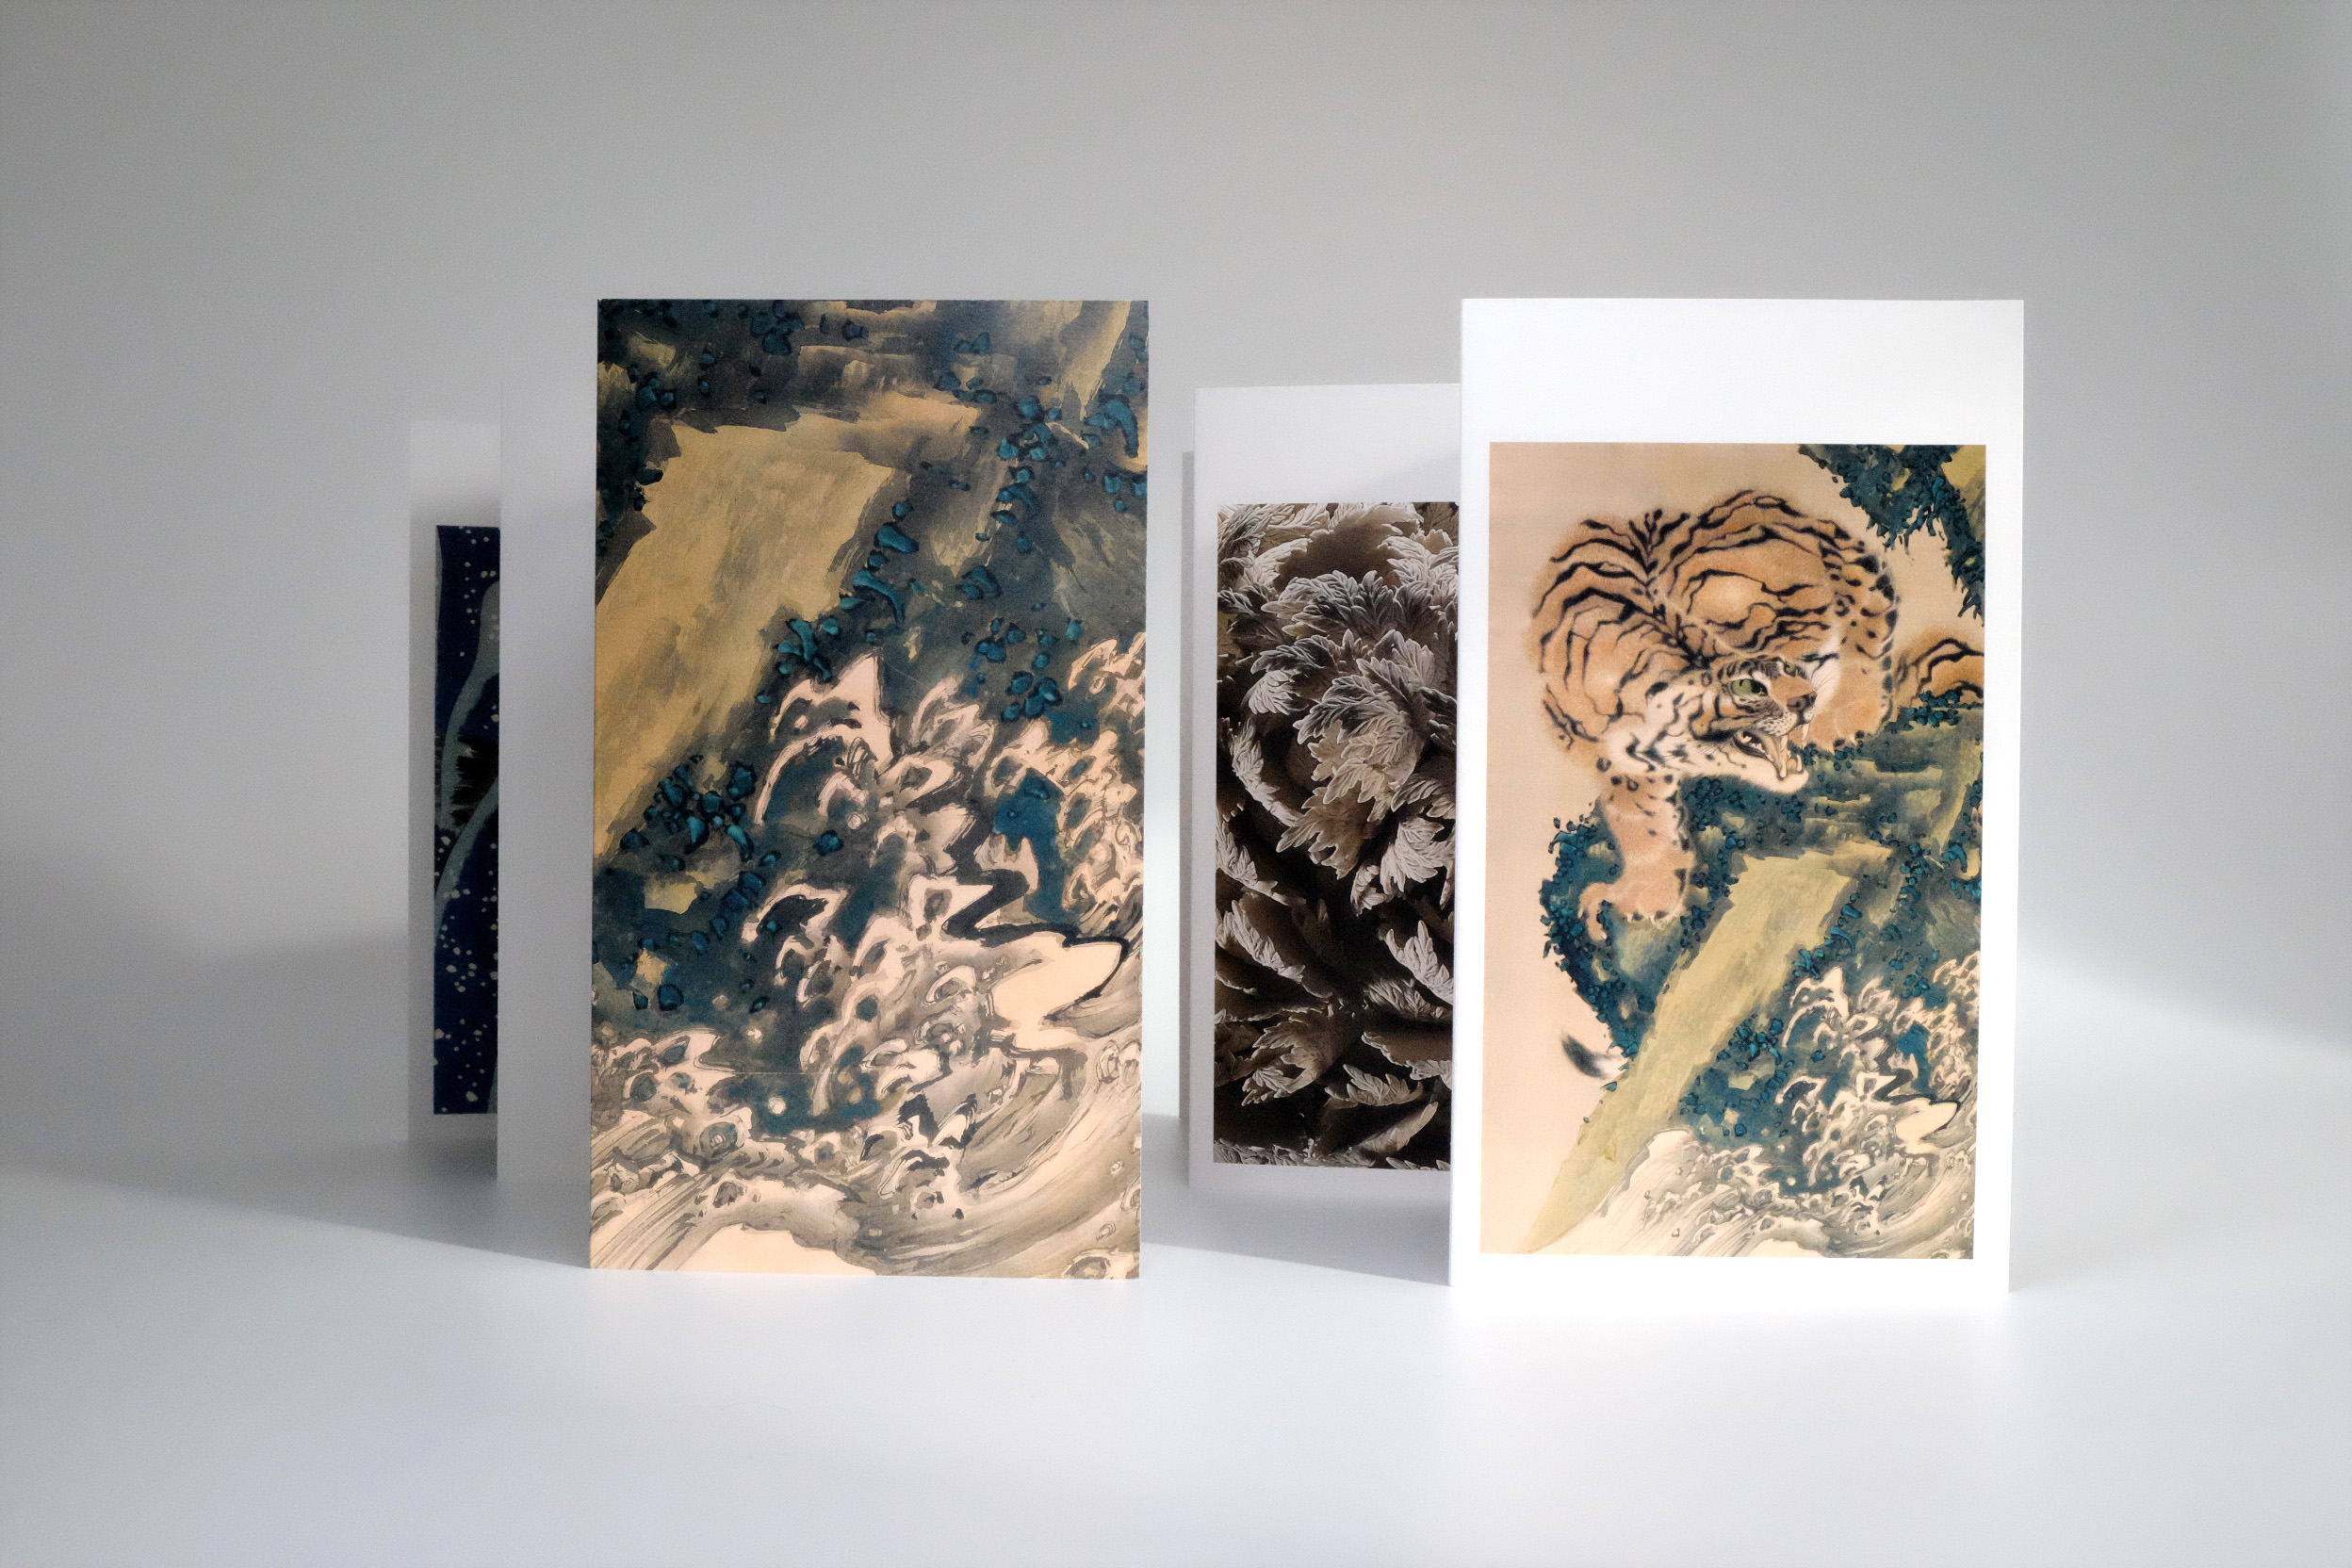 Japanese Galleries invitations